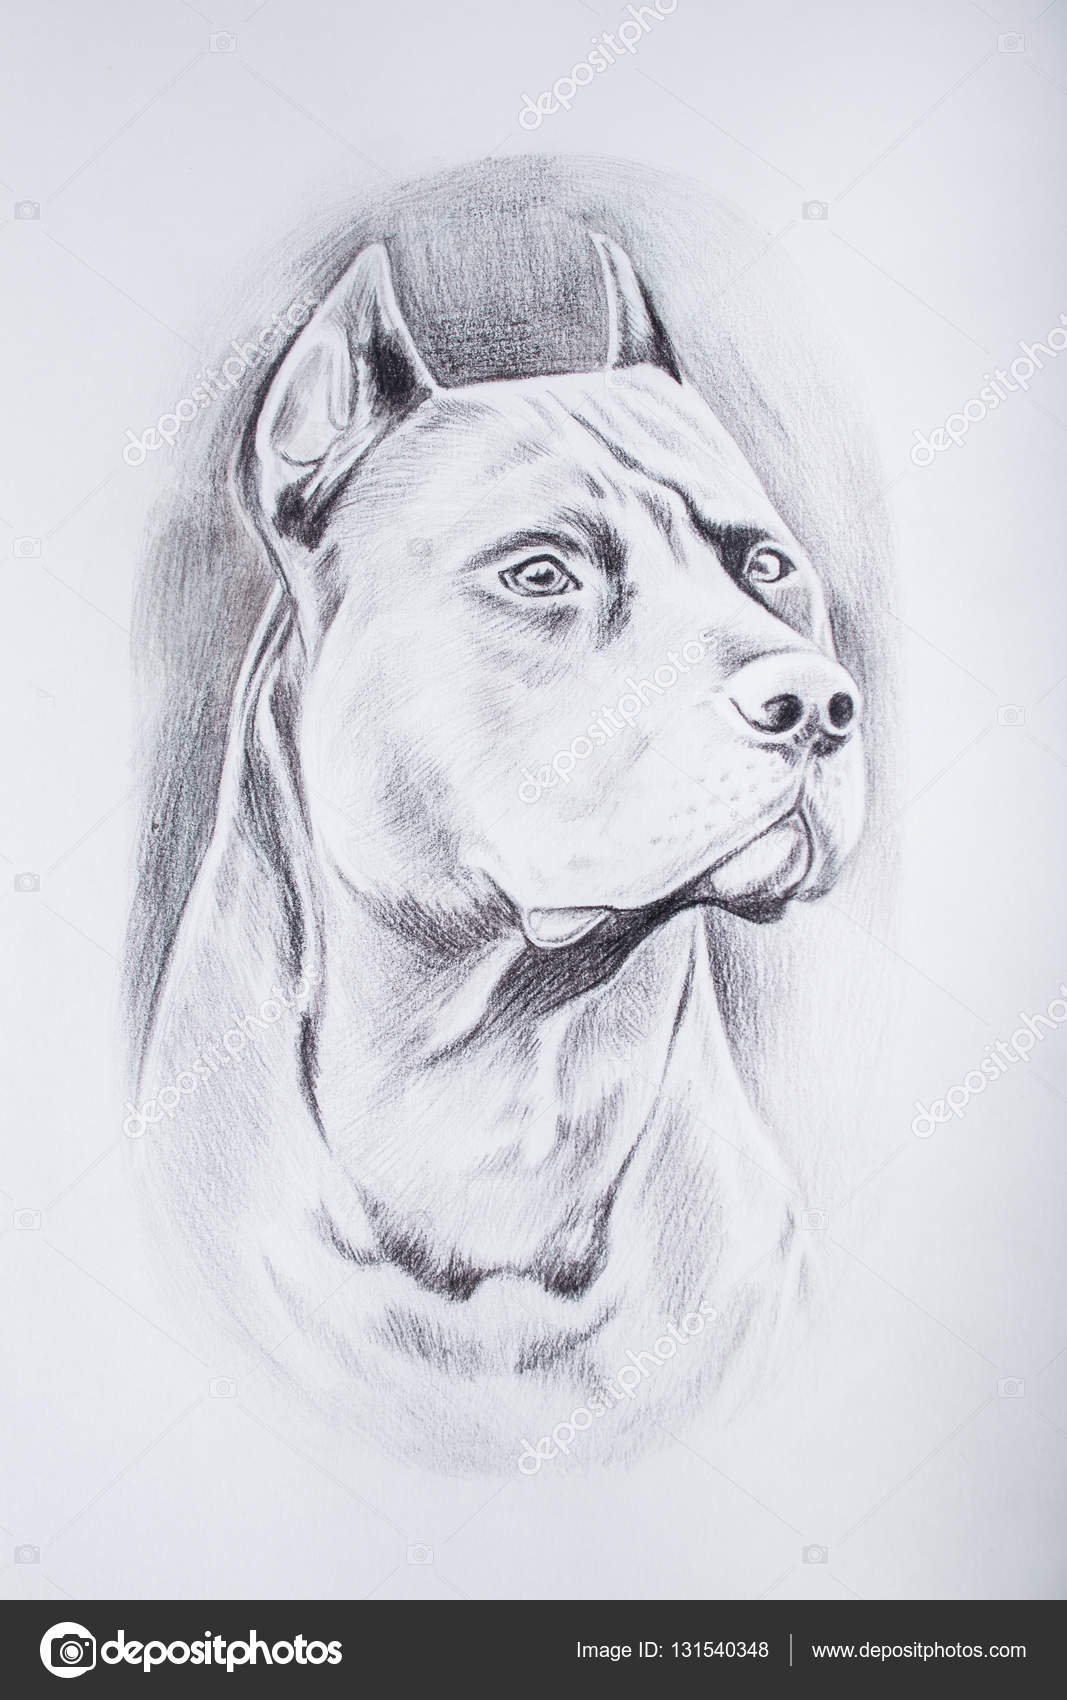 Imágenes Dibujo A Lapiz Dibujo A Lápiz Del Perro Sobre Fondo